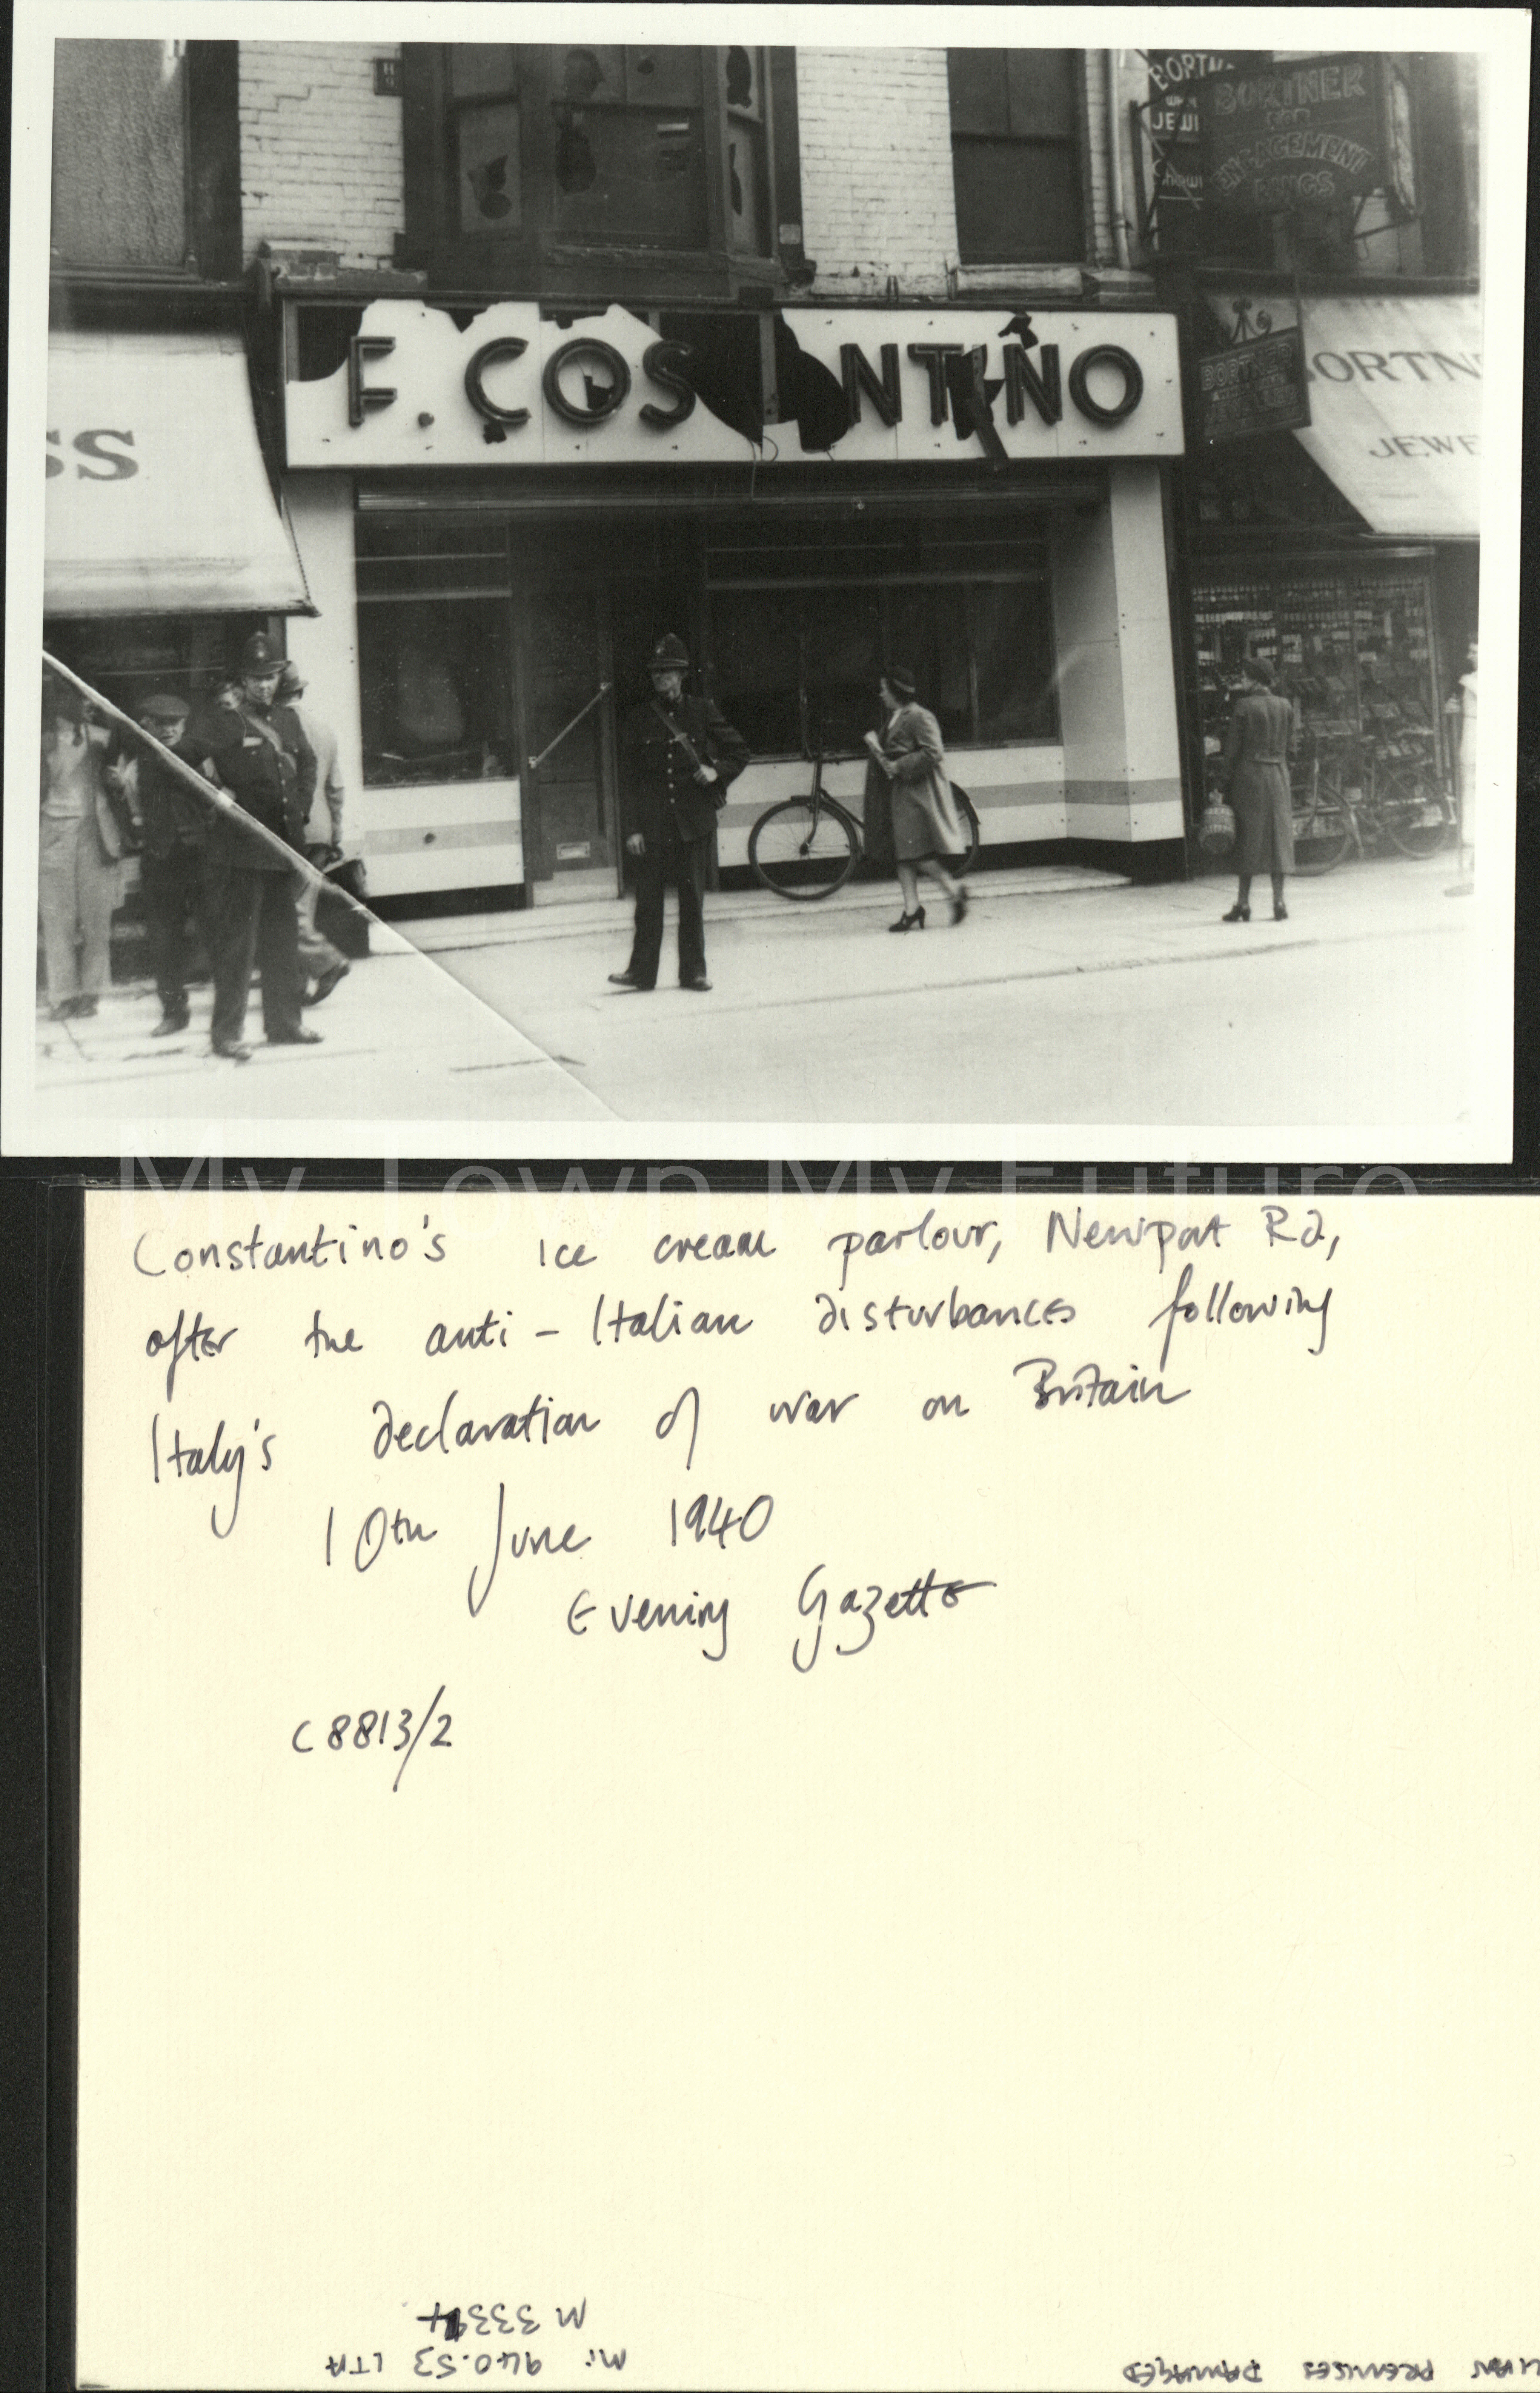 Constanio's Ice Cream - Newport Road - Anti-italian - Disturbances, 10th June 1940 - After Italy Declaration of War against the Allies - Evening Gazette